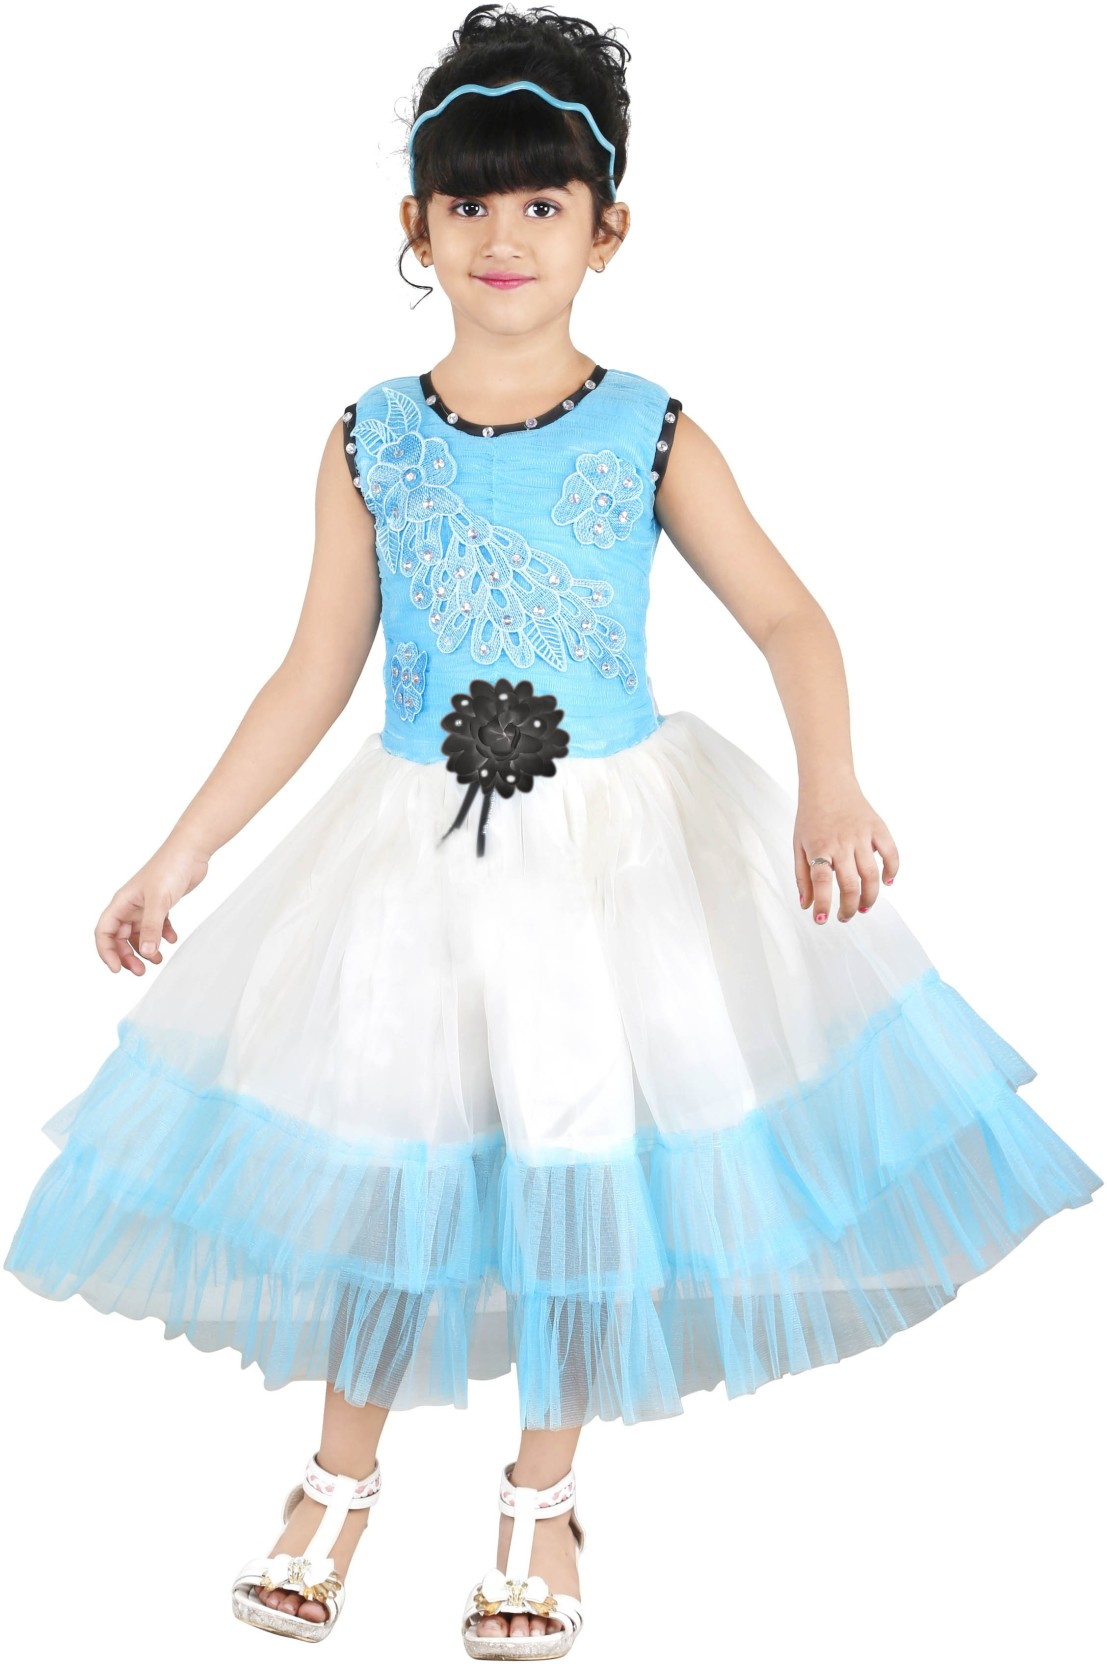 Buy knee length dresses online india